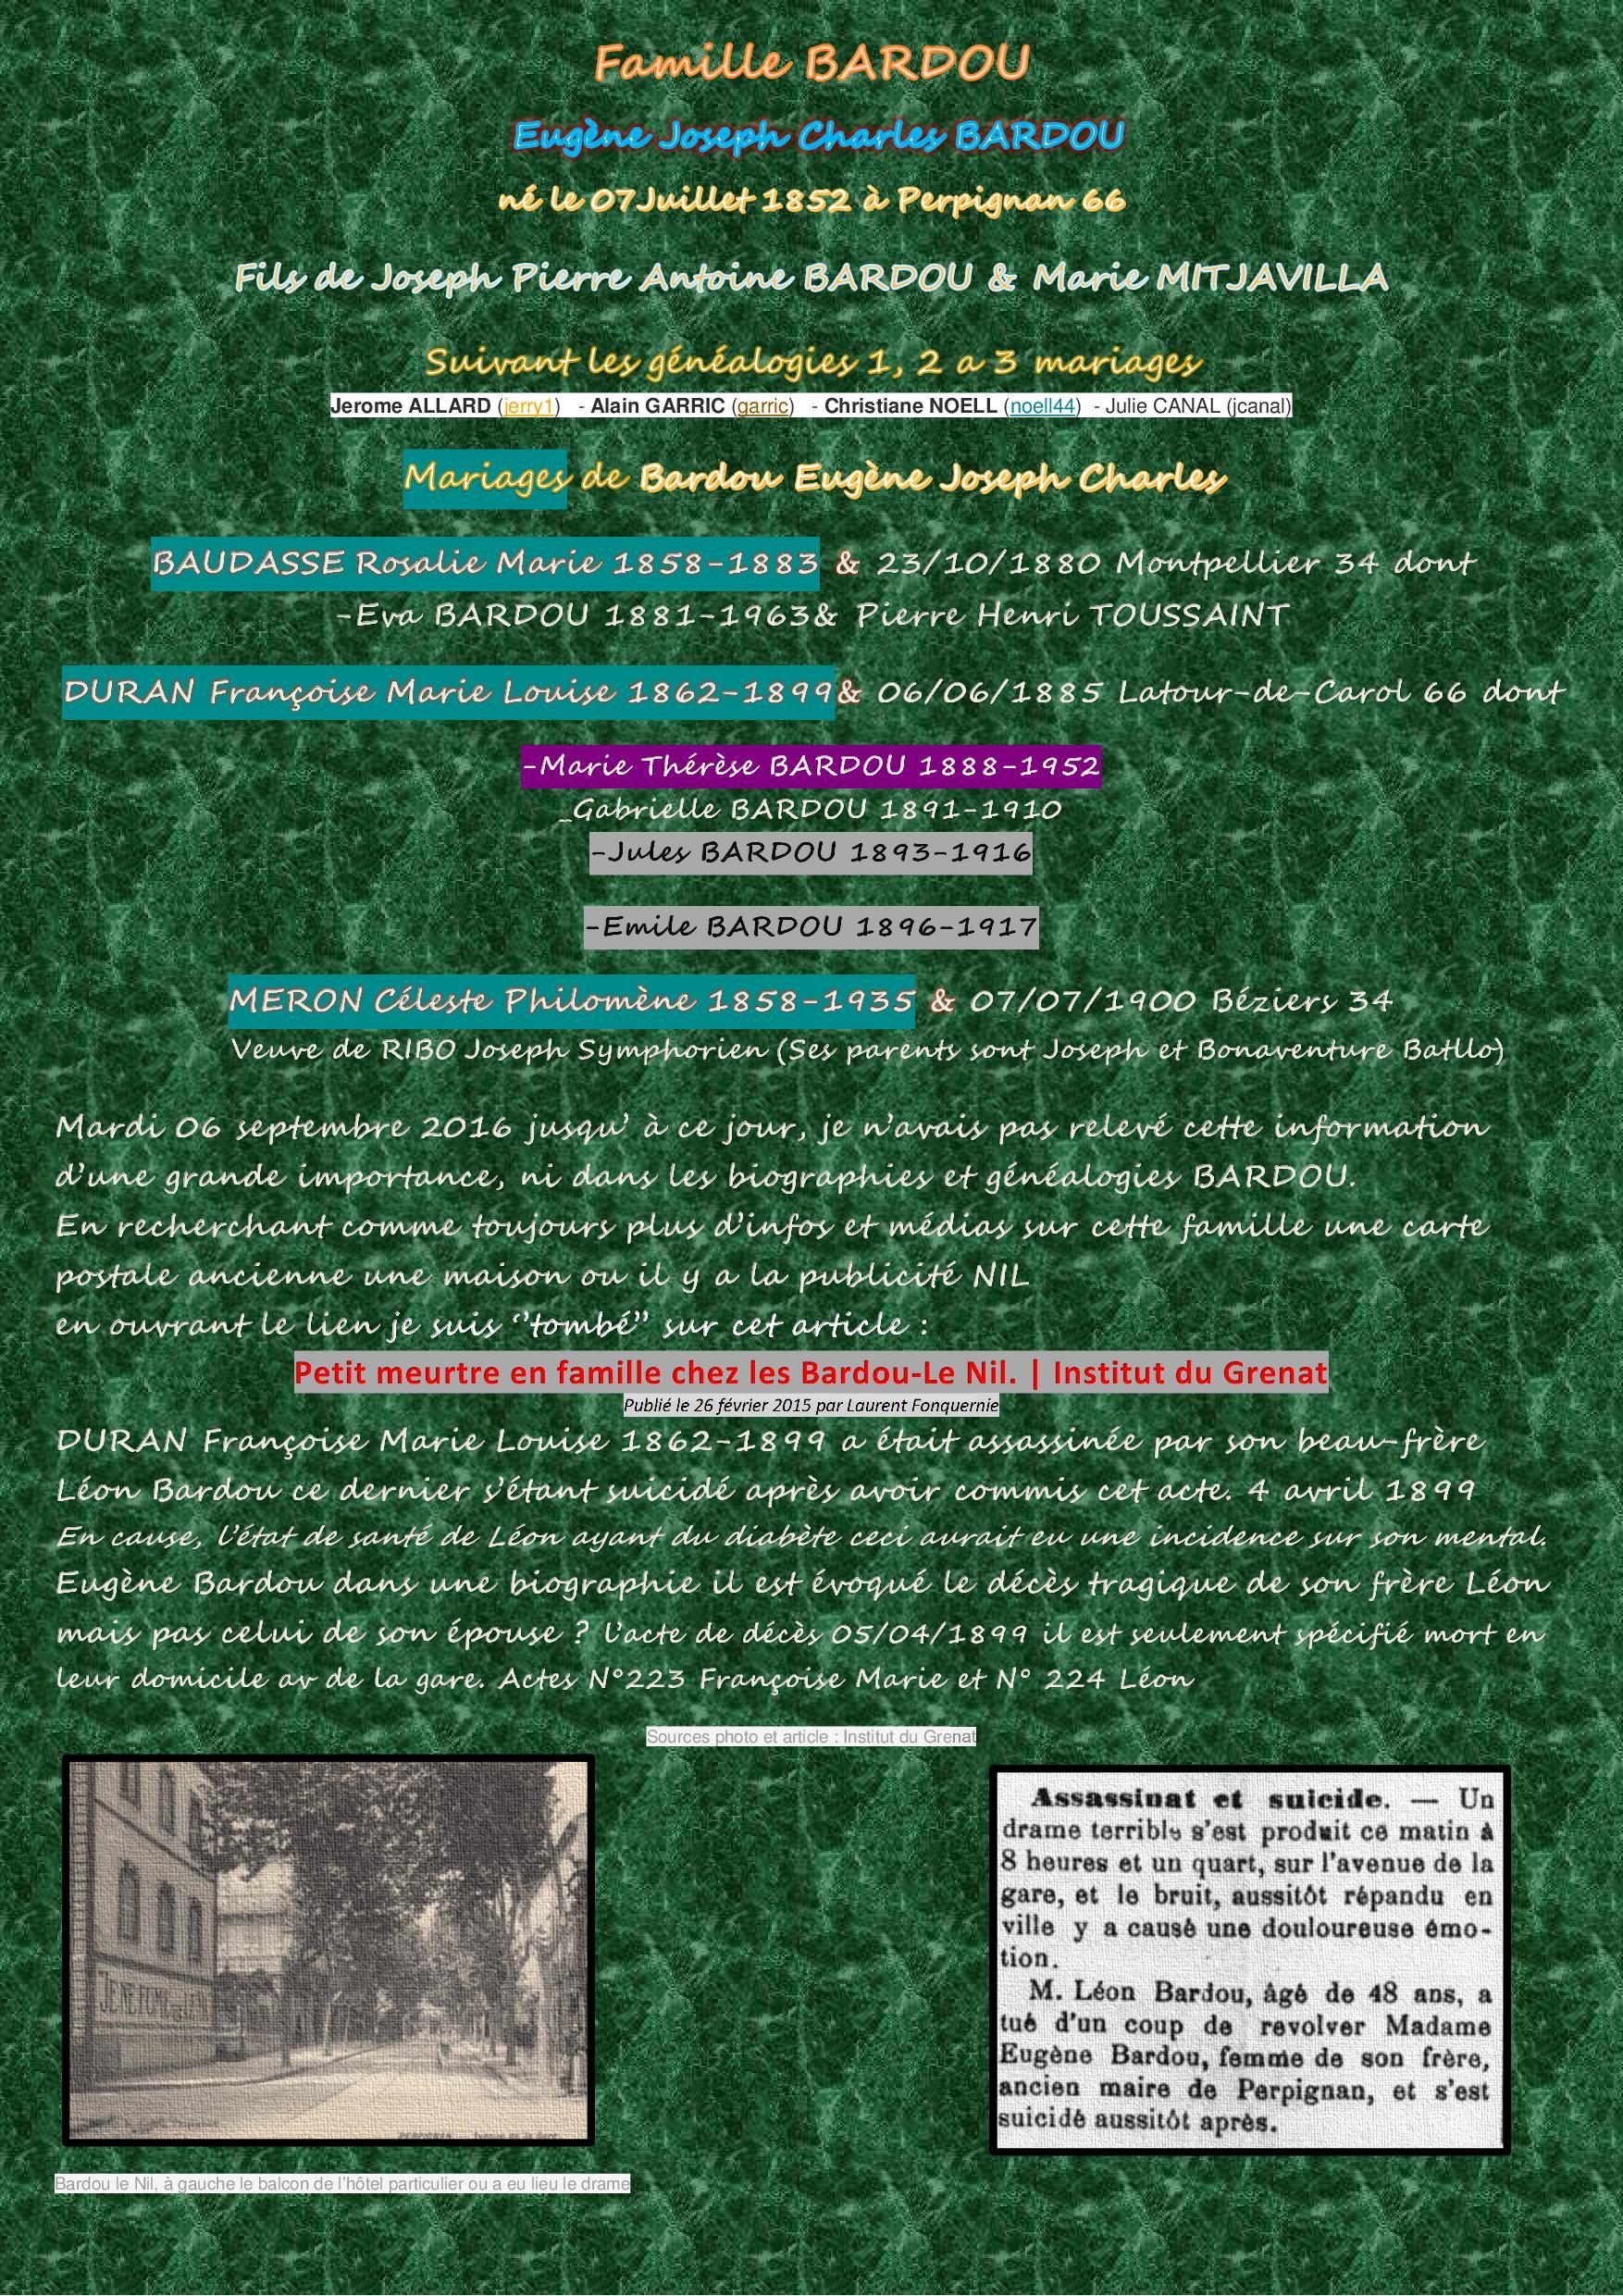 Presentation_mise_a_jour_genealogie_24_Septembre_2016_5.jpg